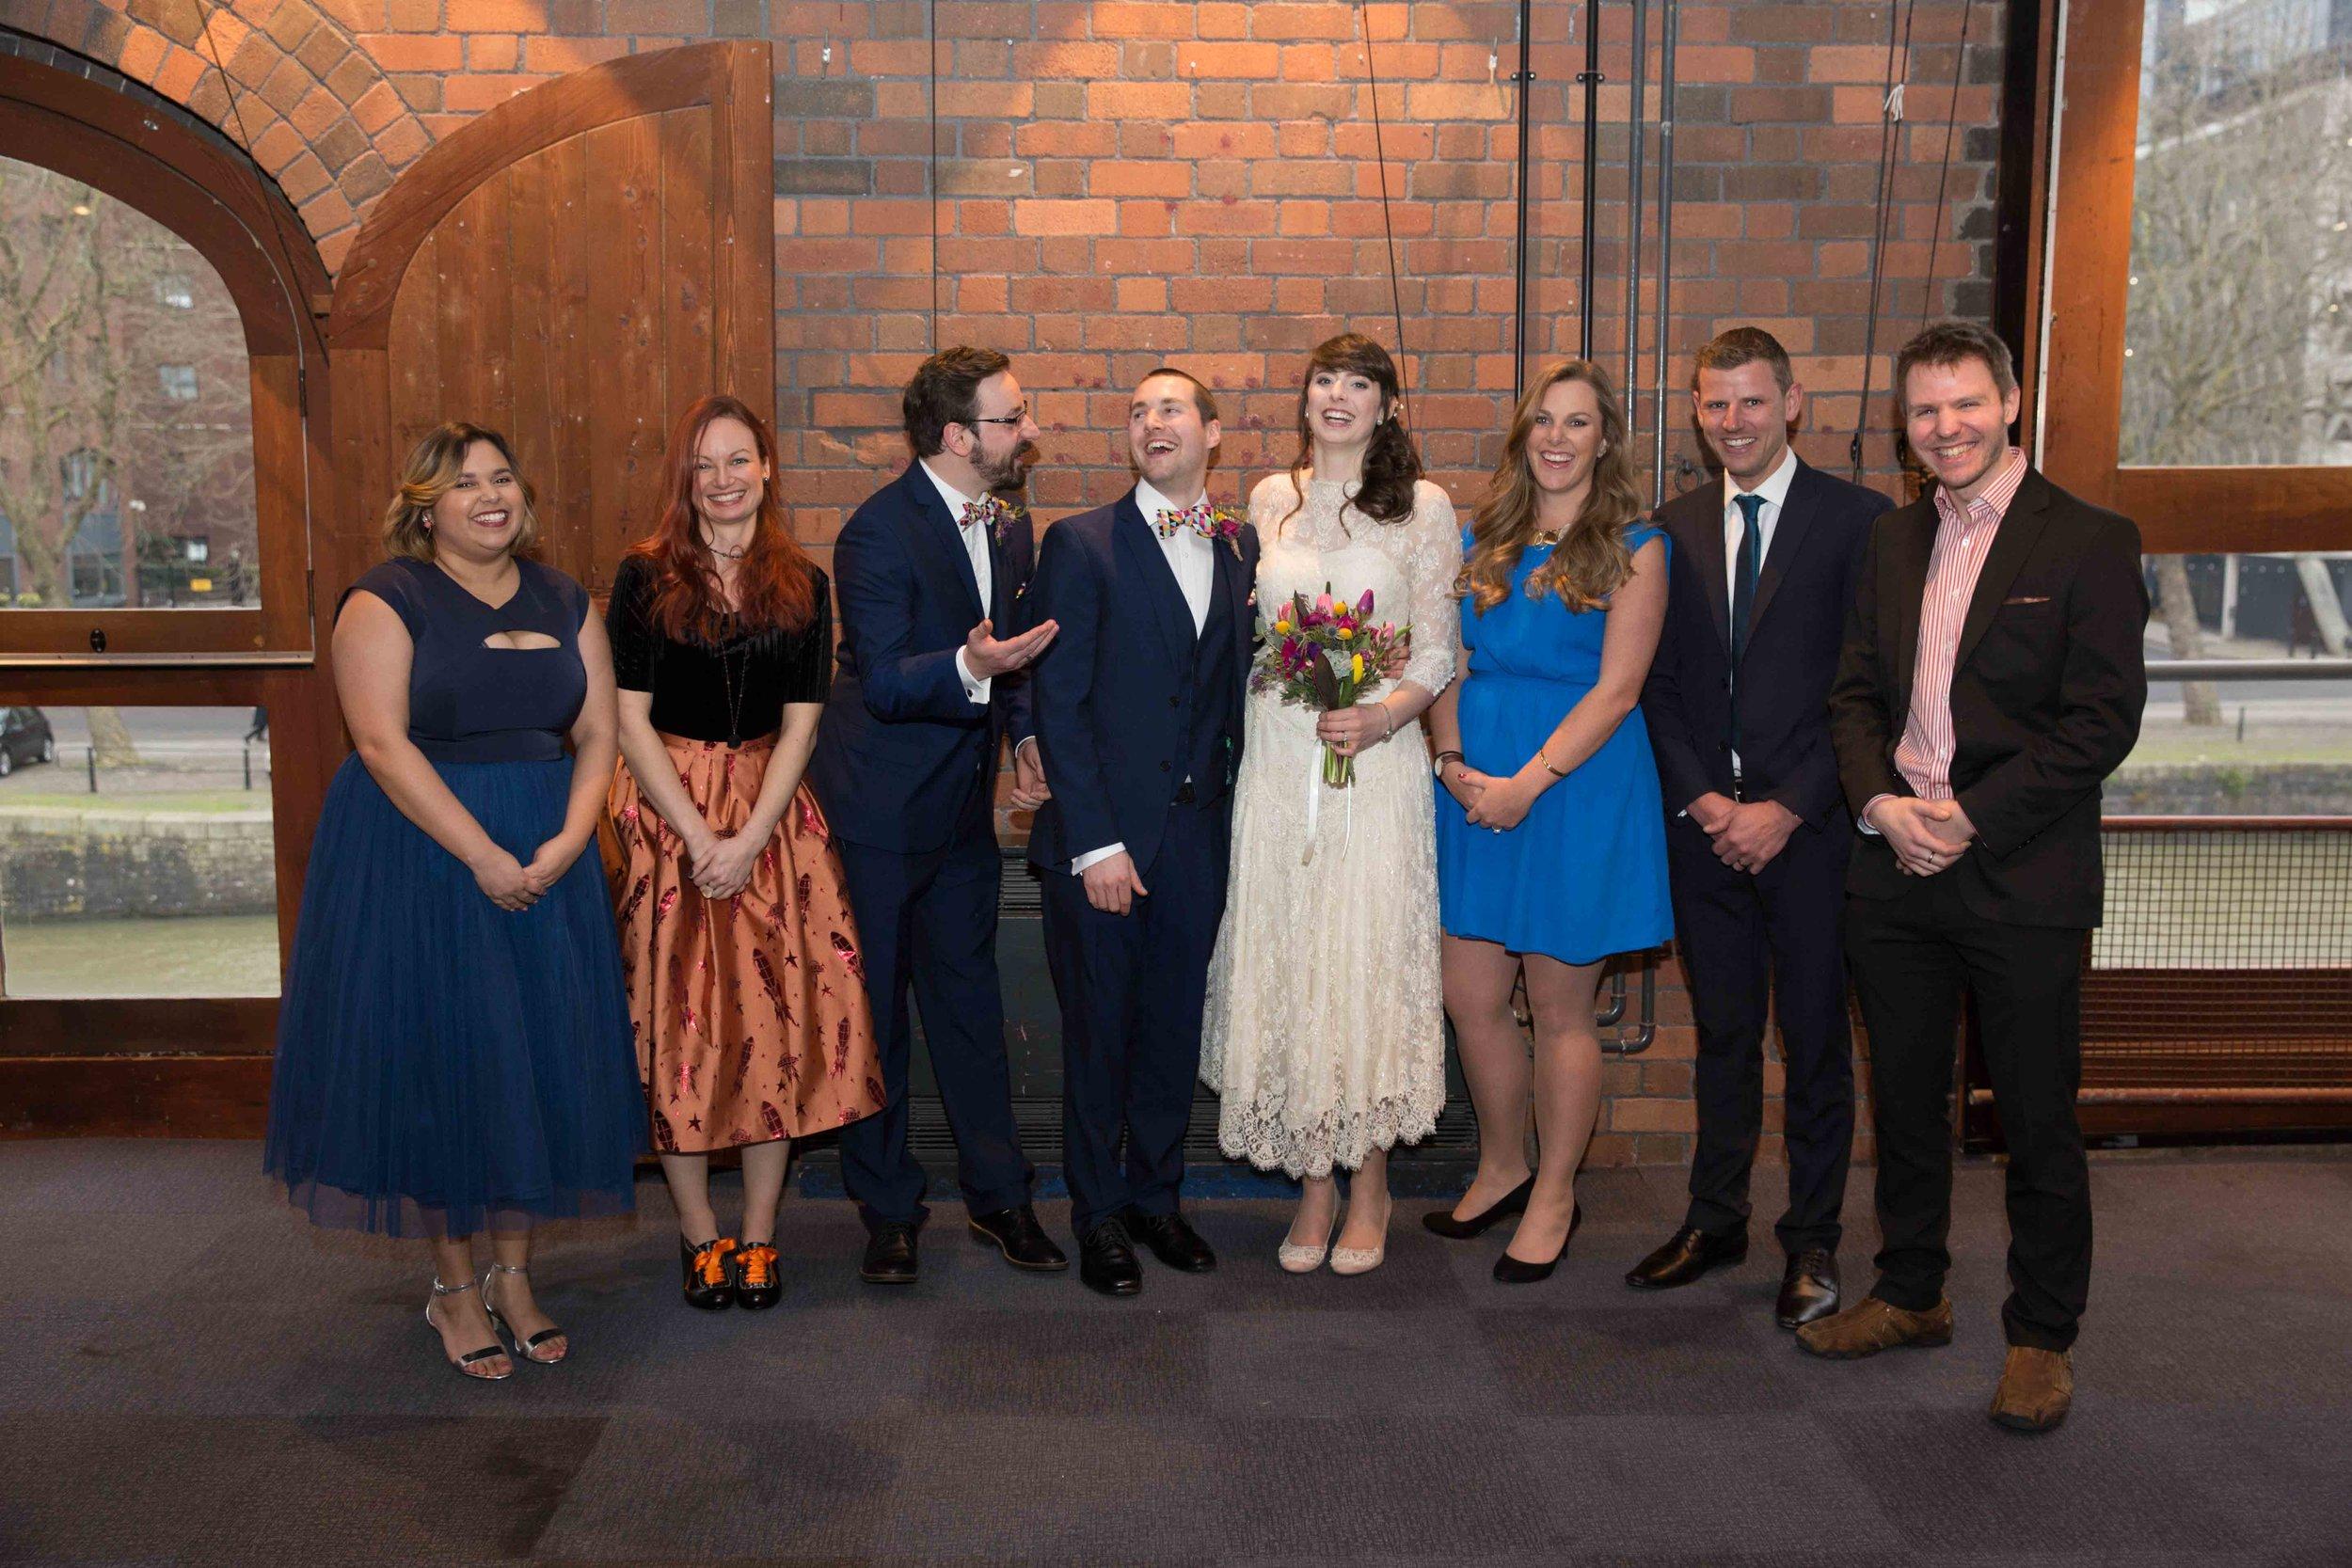 Adam & Faye - Wright Wedding Photography - Bristol Wedding Photographer -221.jpg